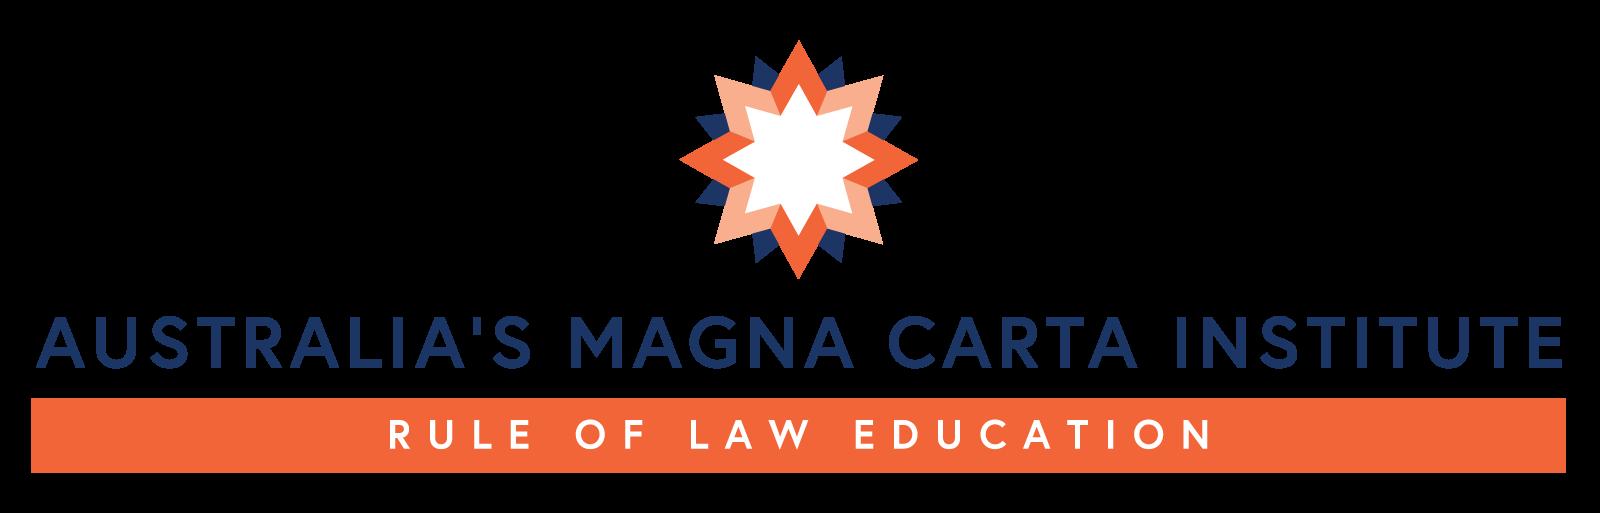 Australia's Magna Carta Institute - Rule of Law Education